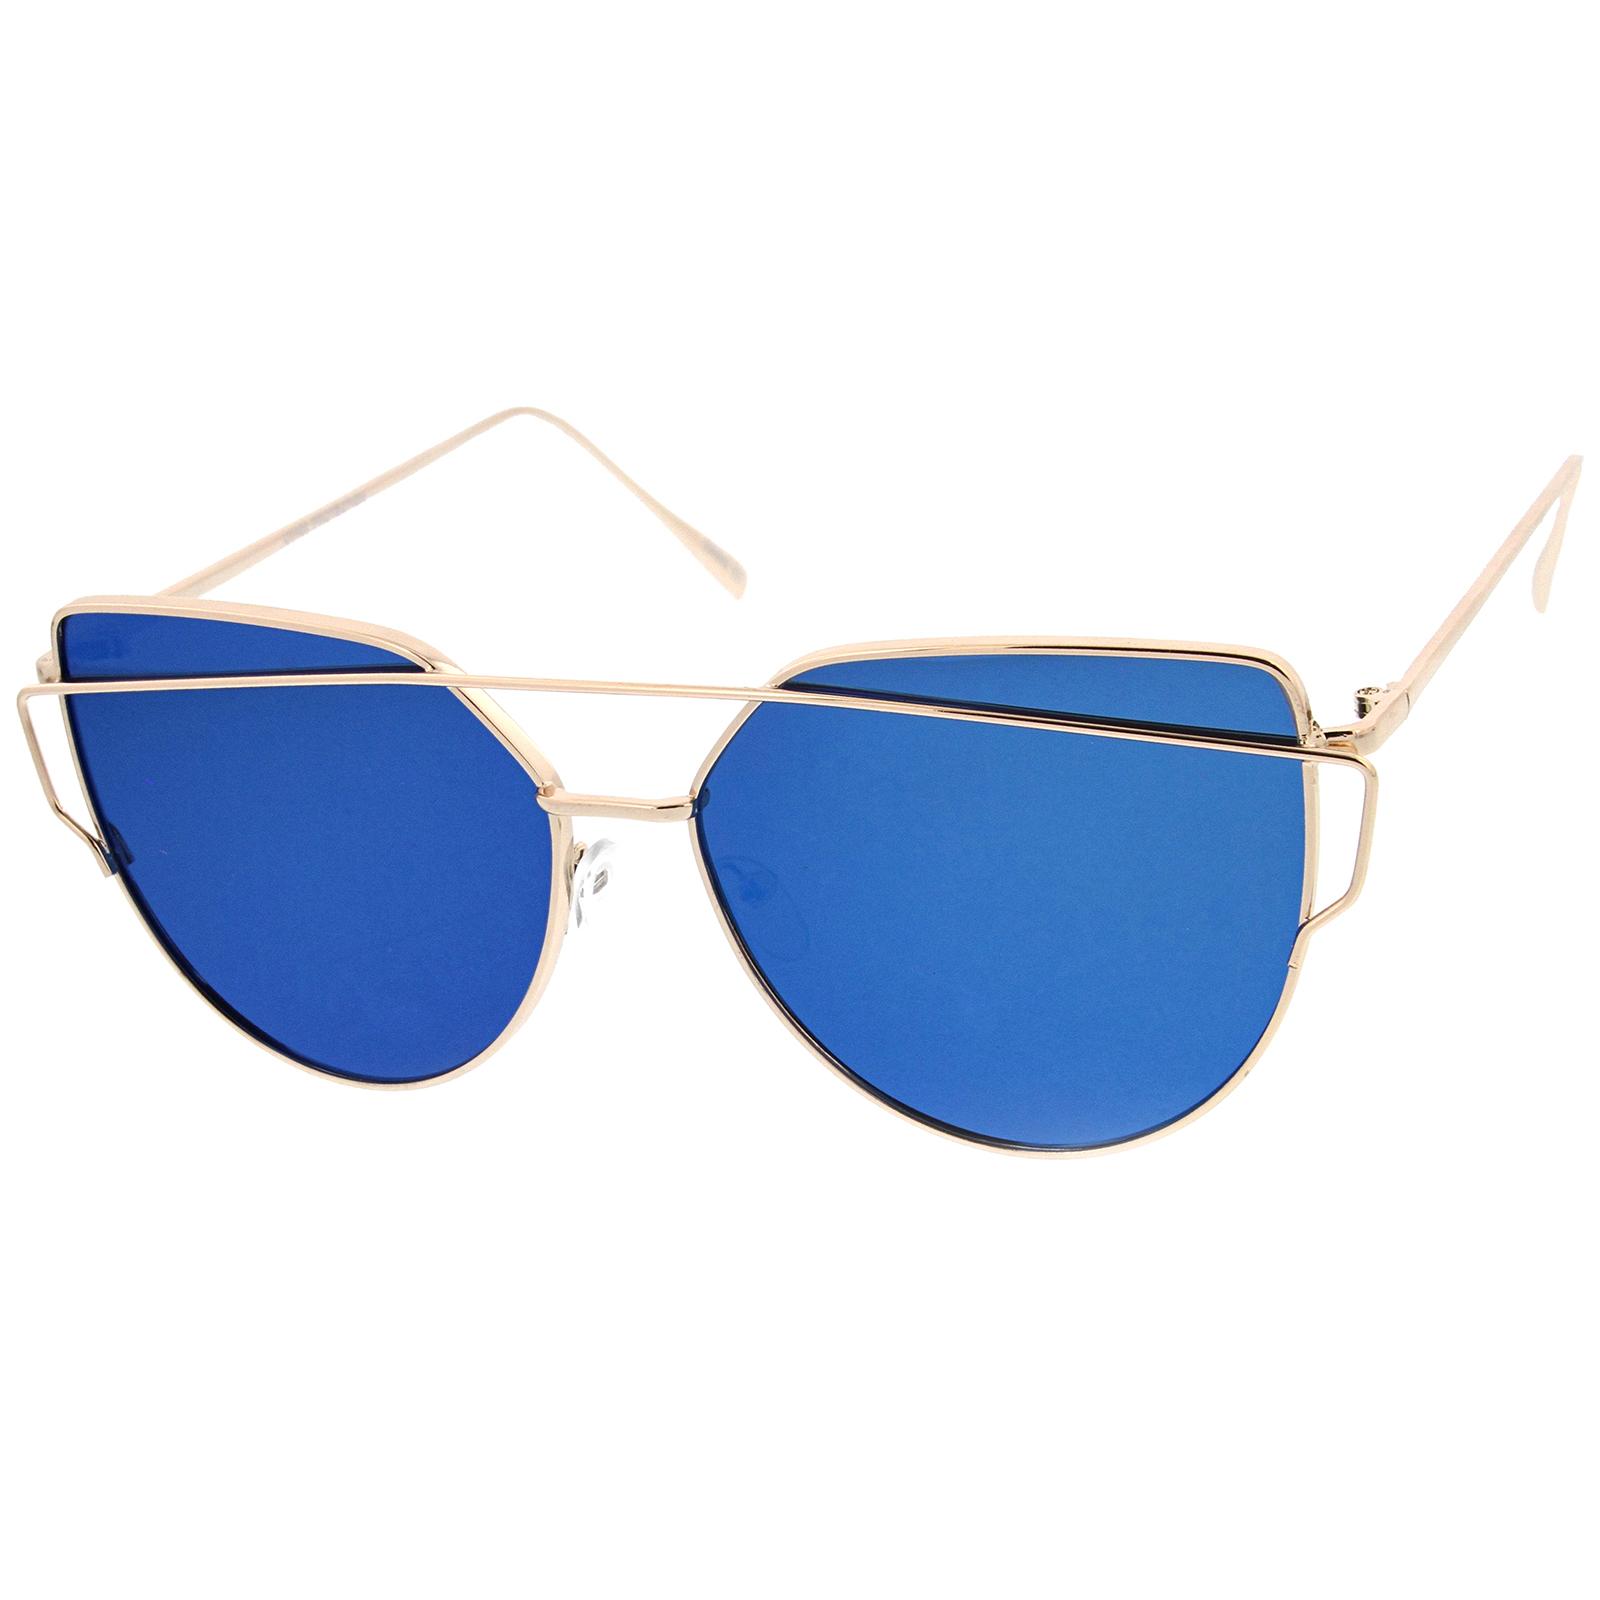 Buy One Get One Free Designer Sunglasses